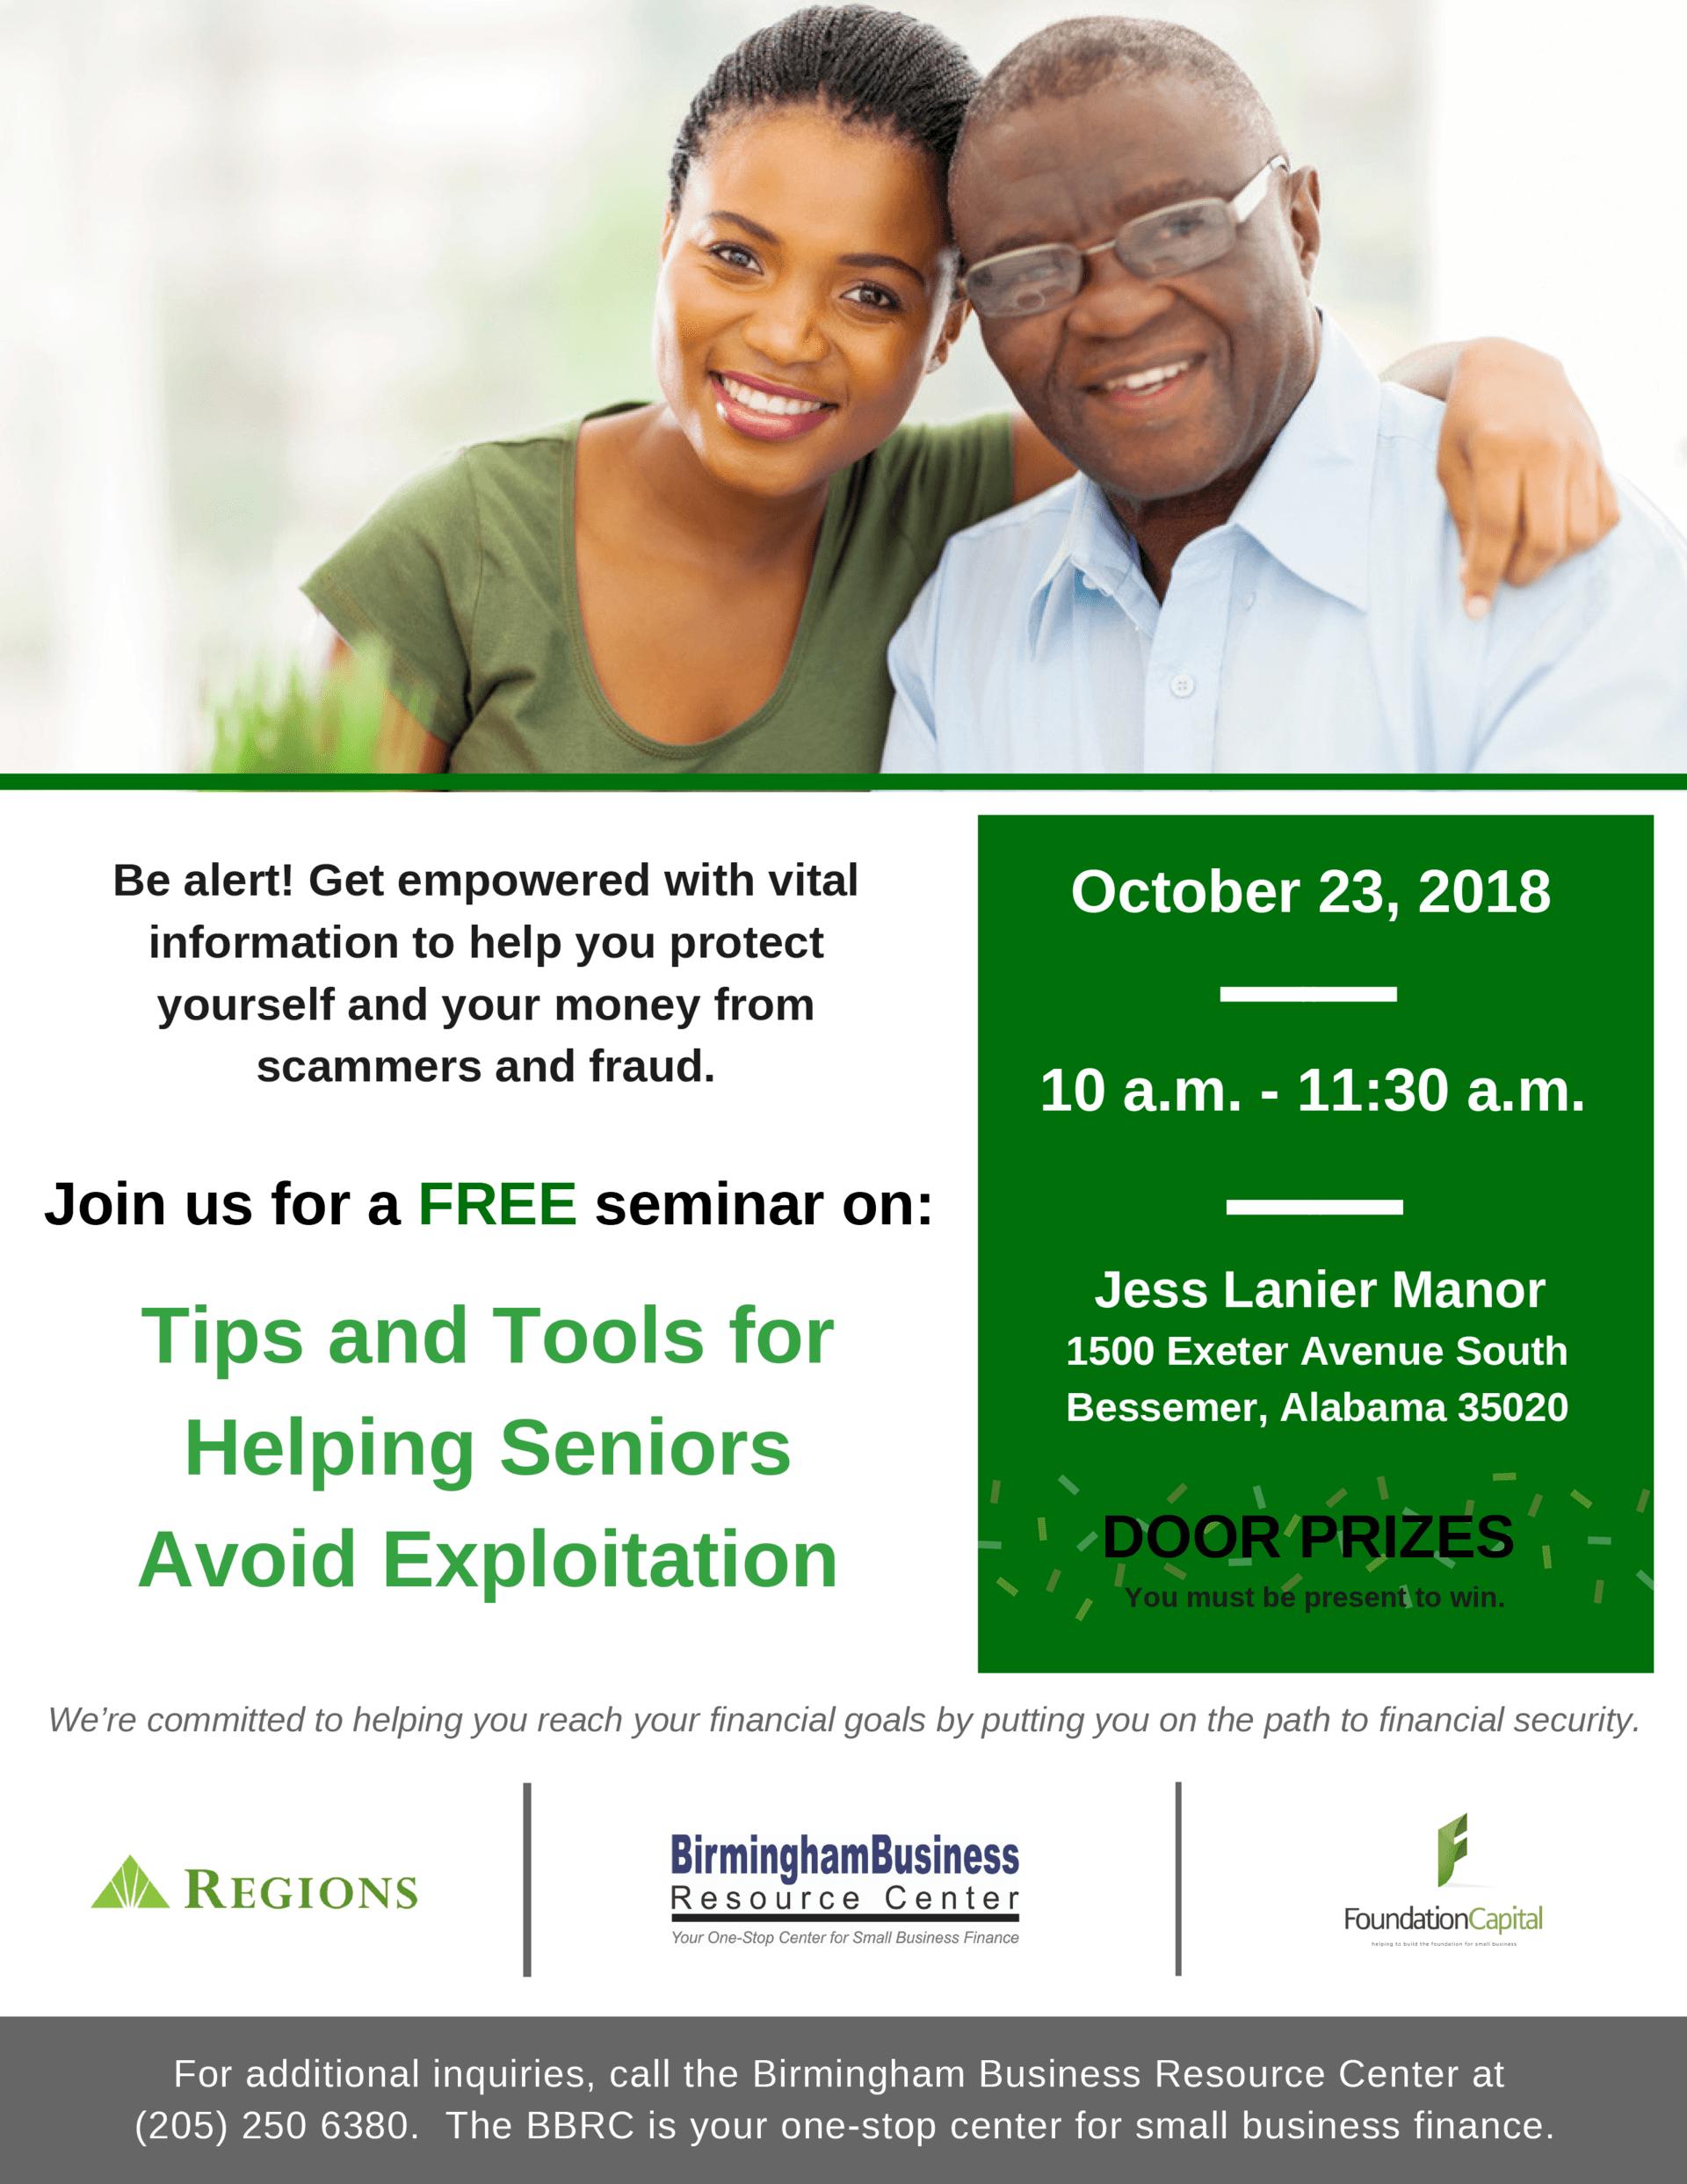 flyer for Regions seminar Tips and Tools for Helping Senior Avoid Financial Exploitation